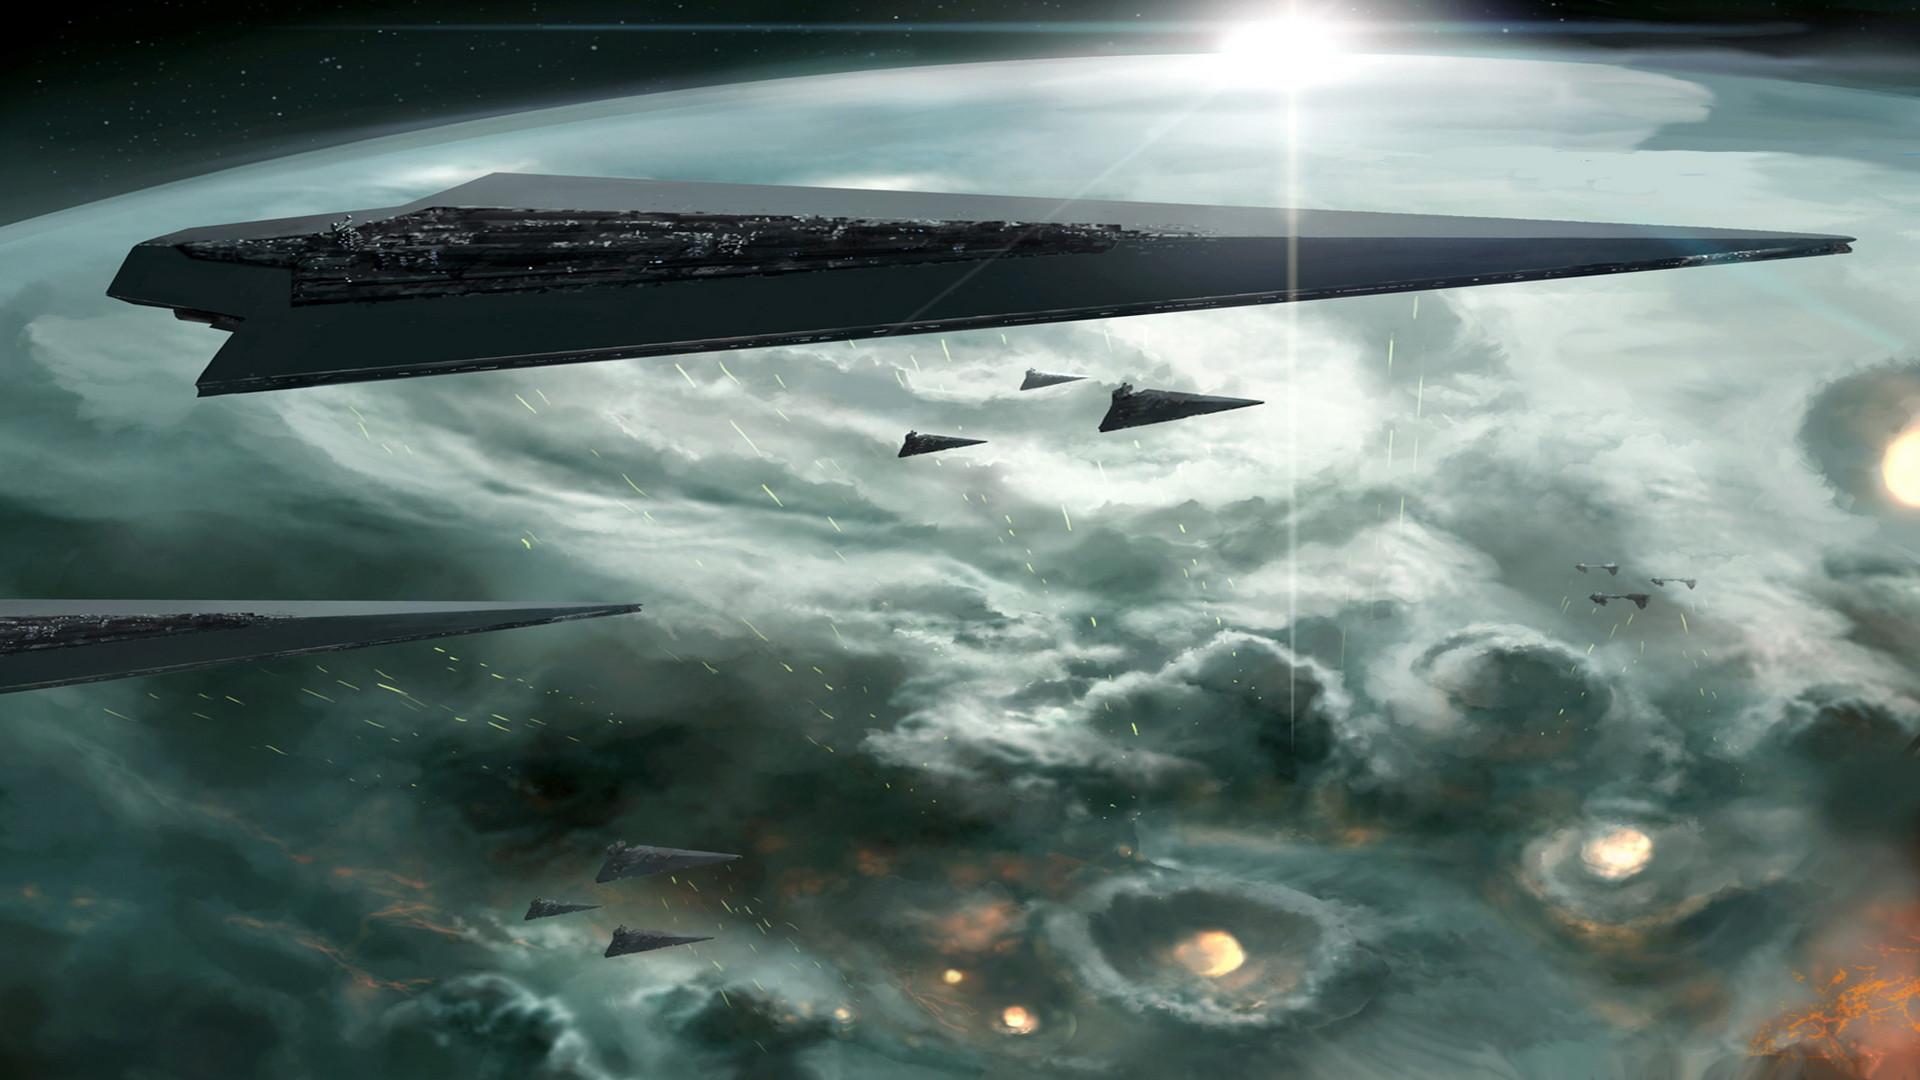 Download Super Star Destroyer Executor Wallpaper Hd Backgrounds Download Itl Cat